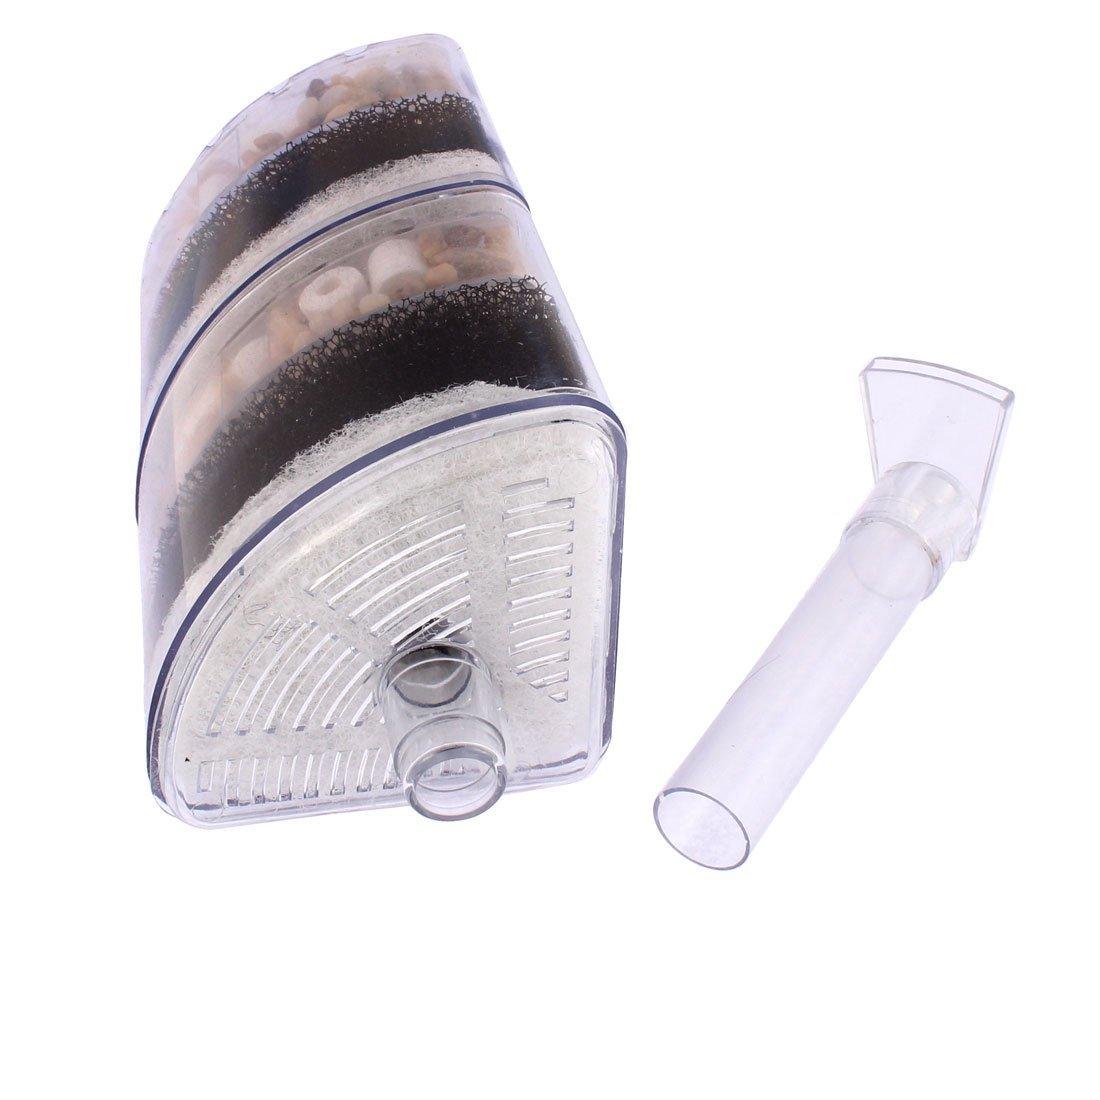 Amazon.com : eDealMax pecera de plástico Aire Impulsado esquina filtro de esponja Bump : Pet Supplies